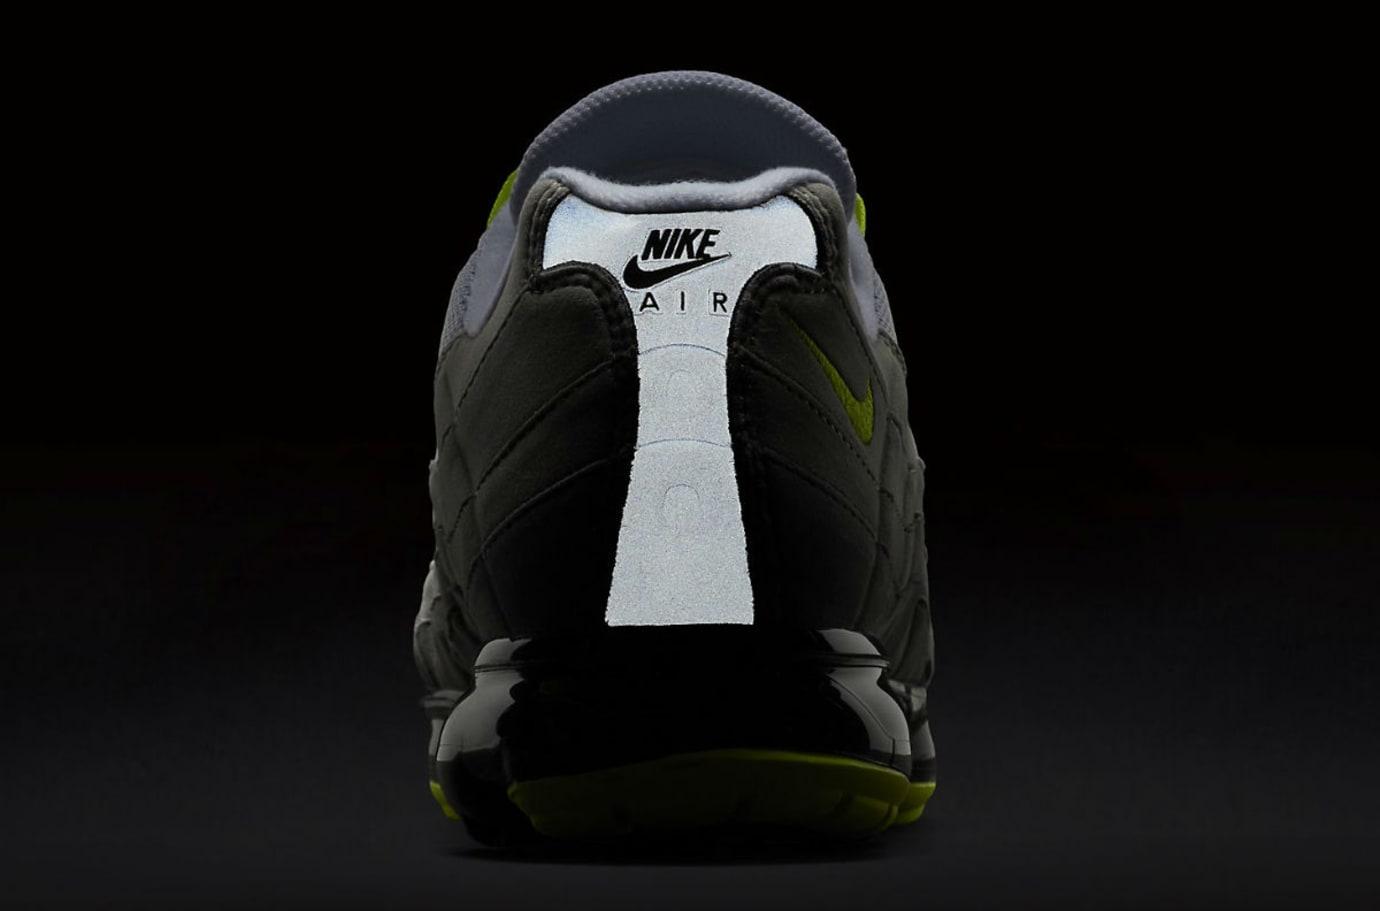 Nike Air VaporMax 95 Black Volt Medium Ash Dark Pewter Dusk Granite Release Date AJ7292-001 3M